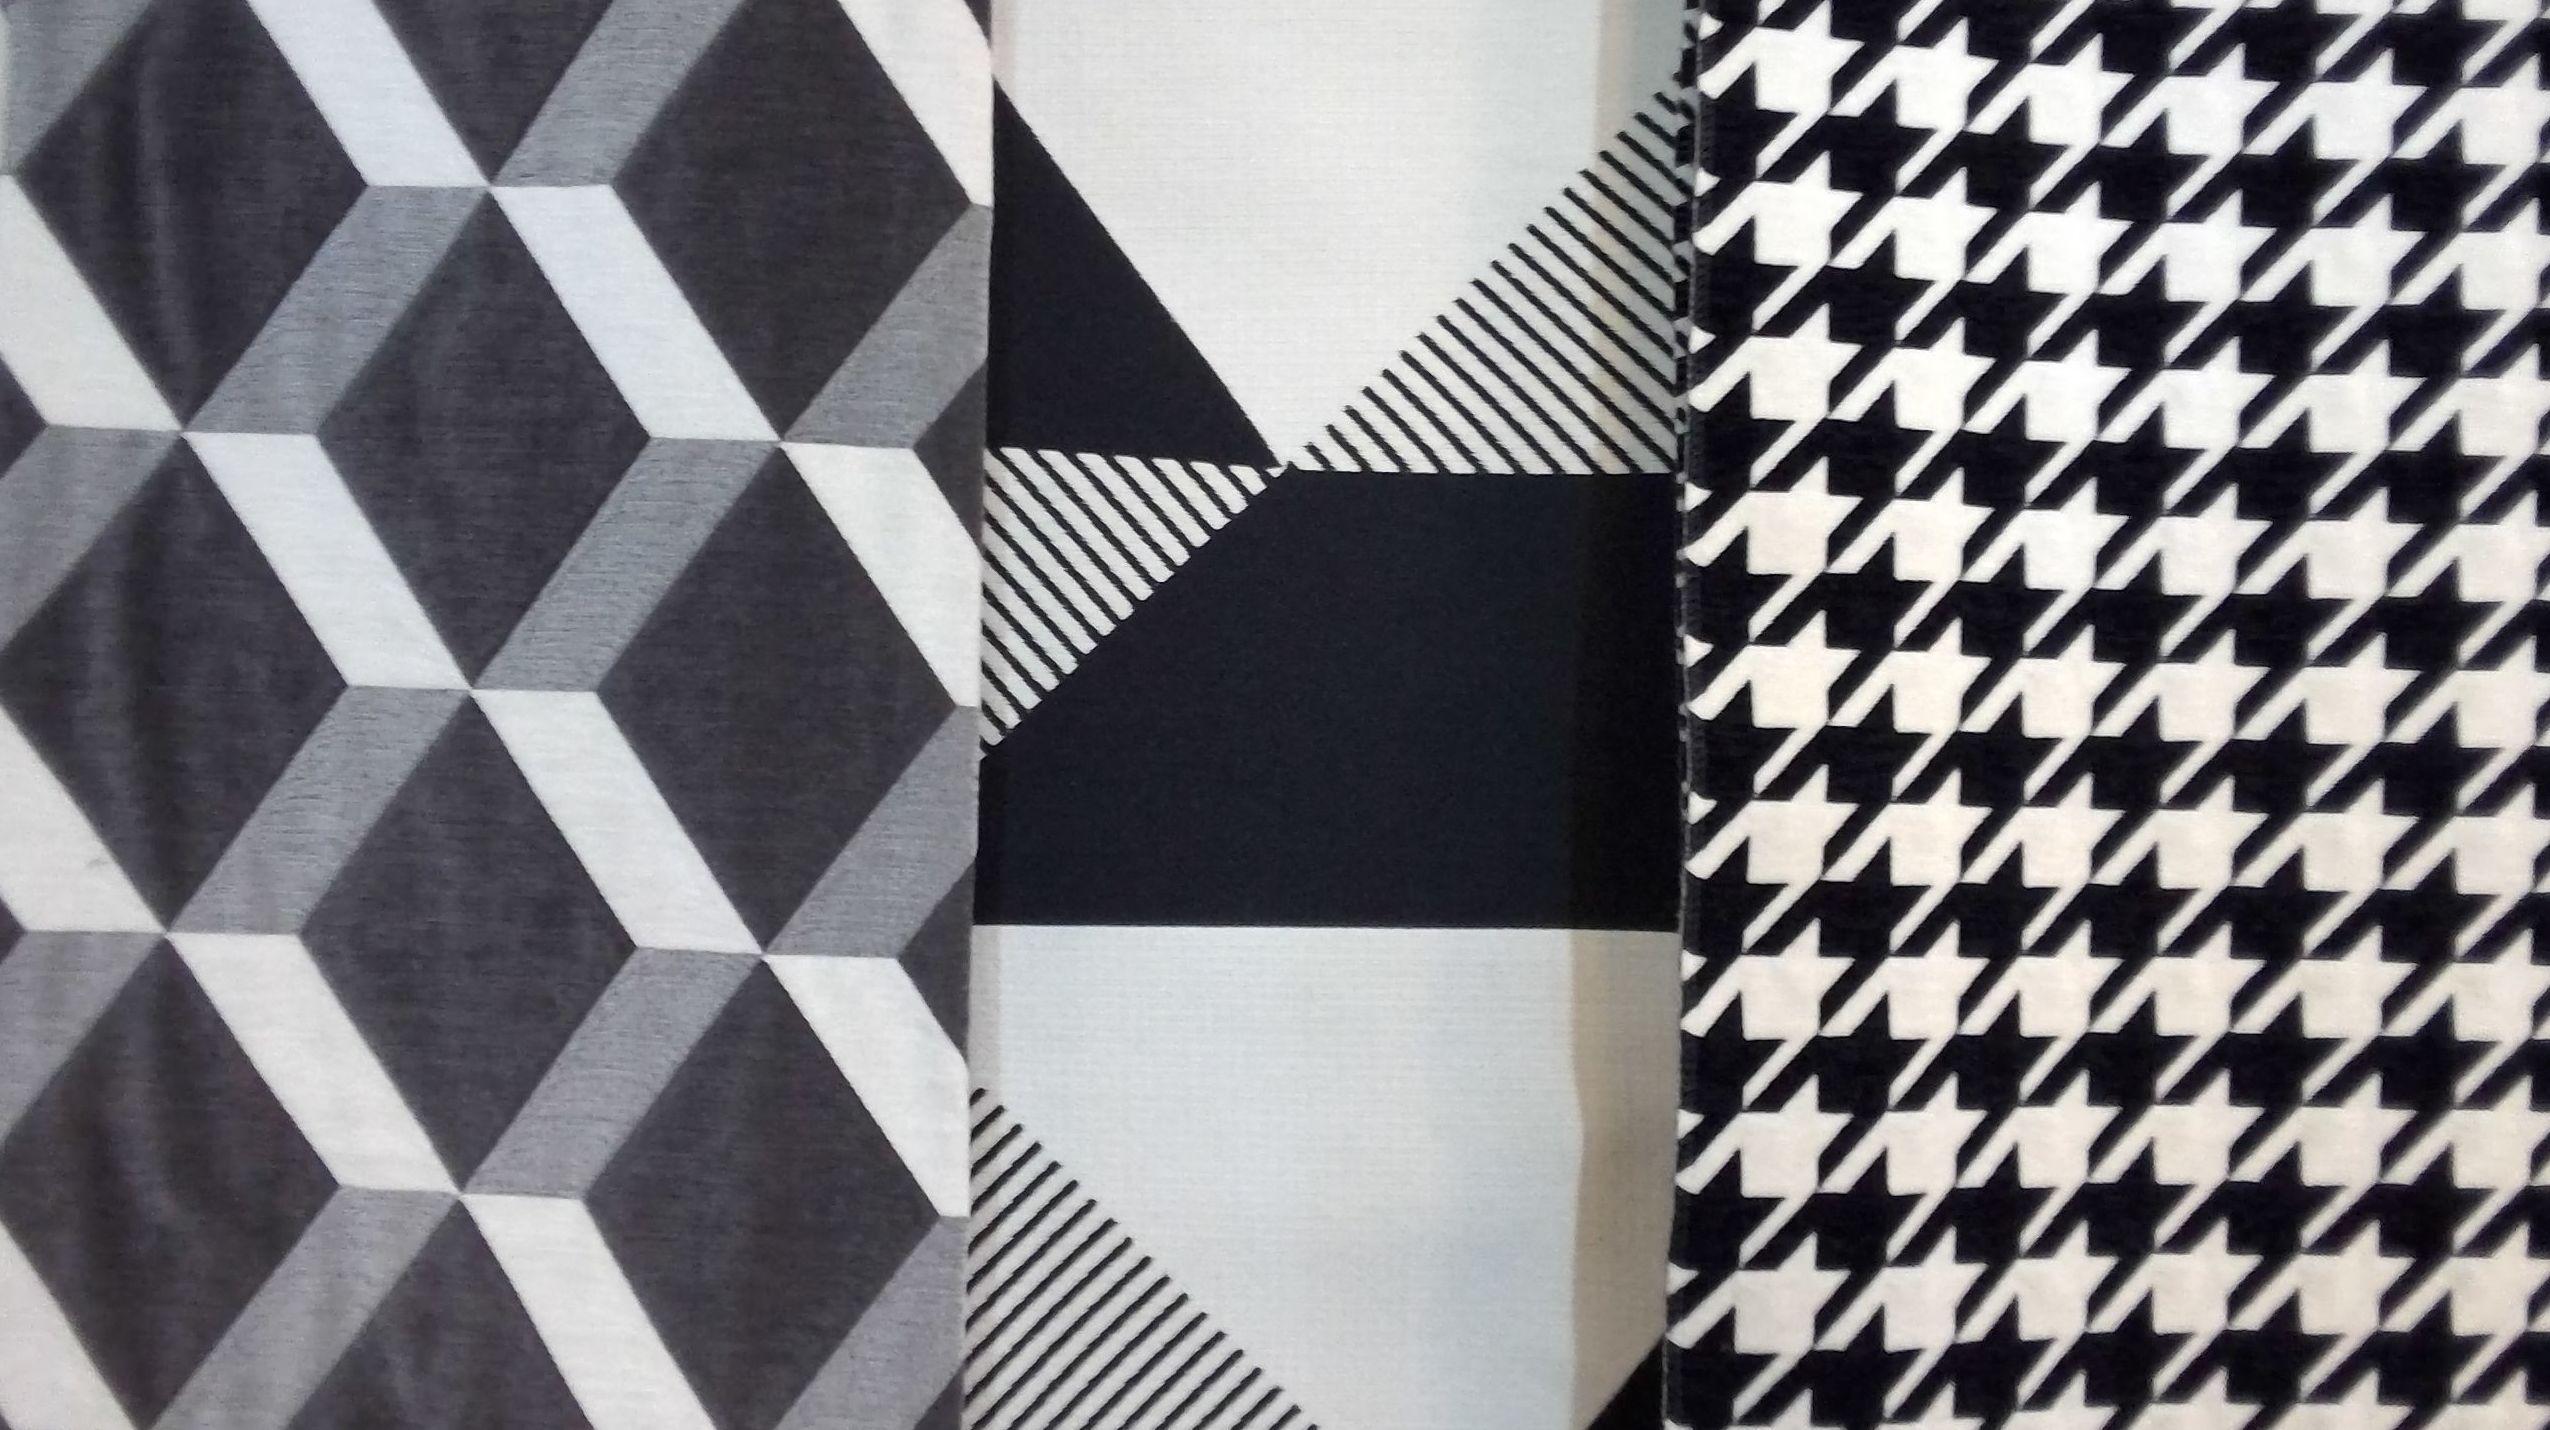 Foto 29 de Decoración textil en Madrid | Diseño Textil